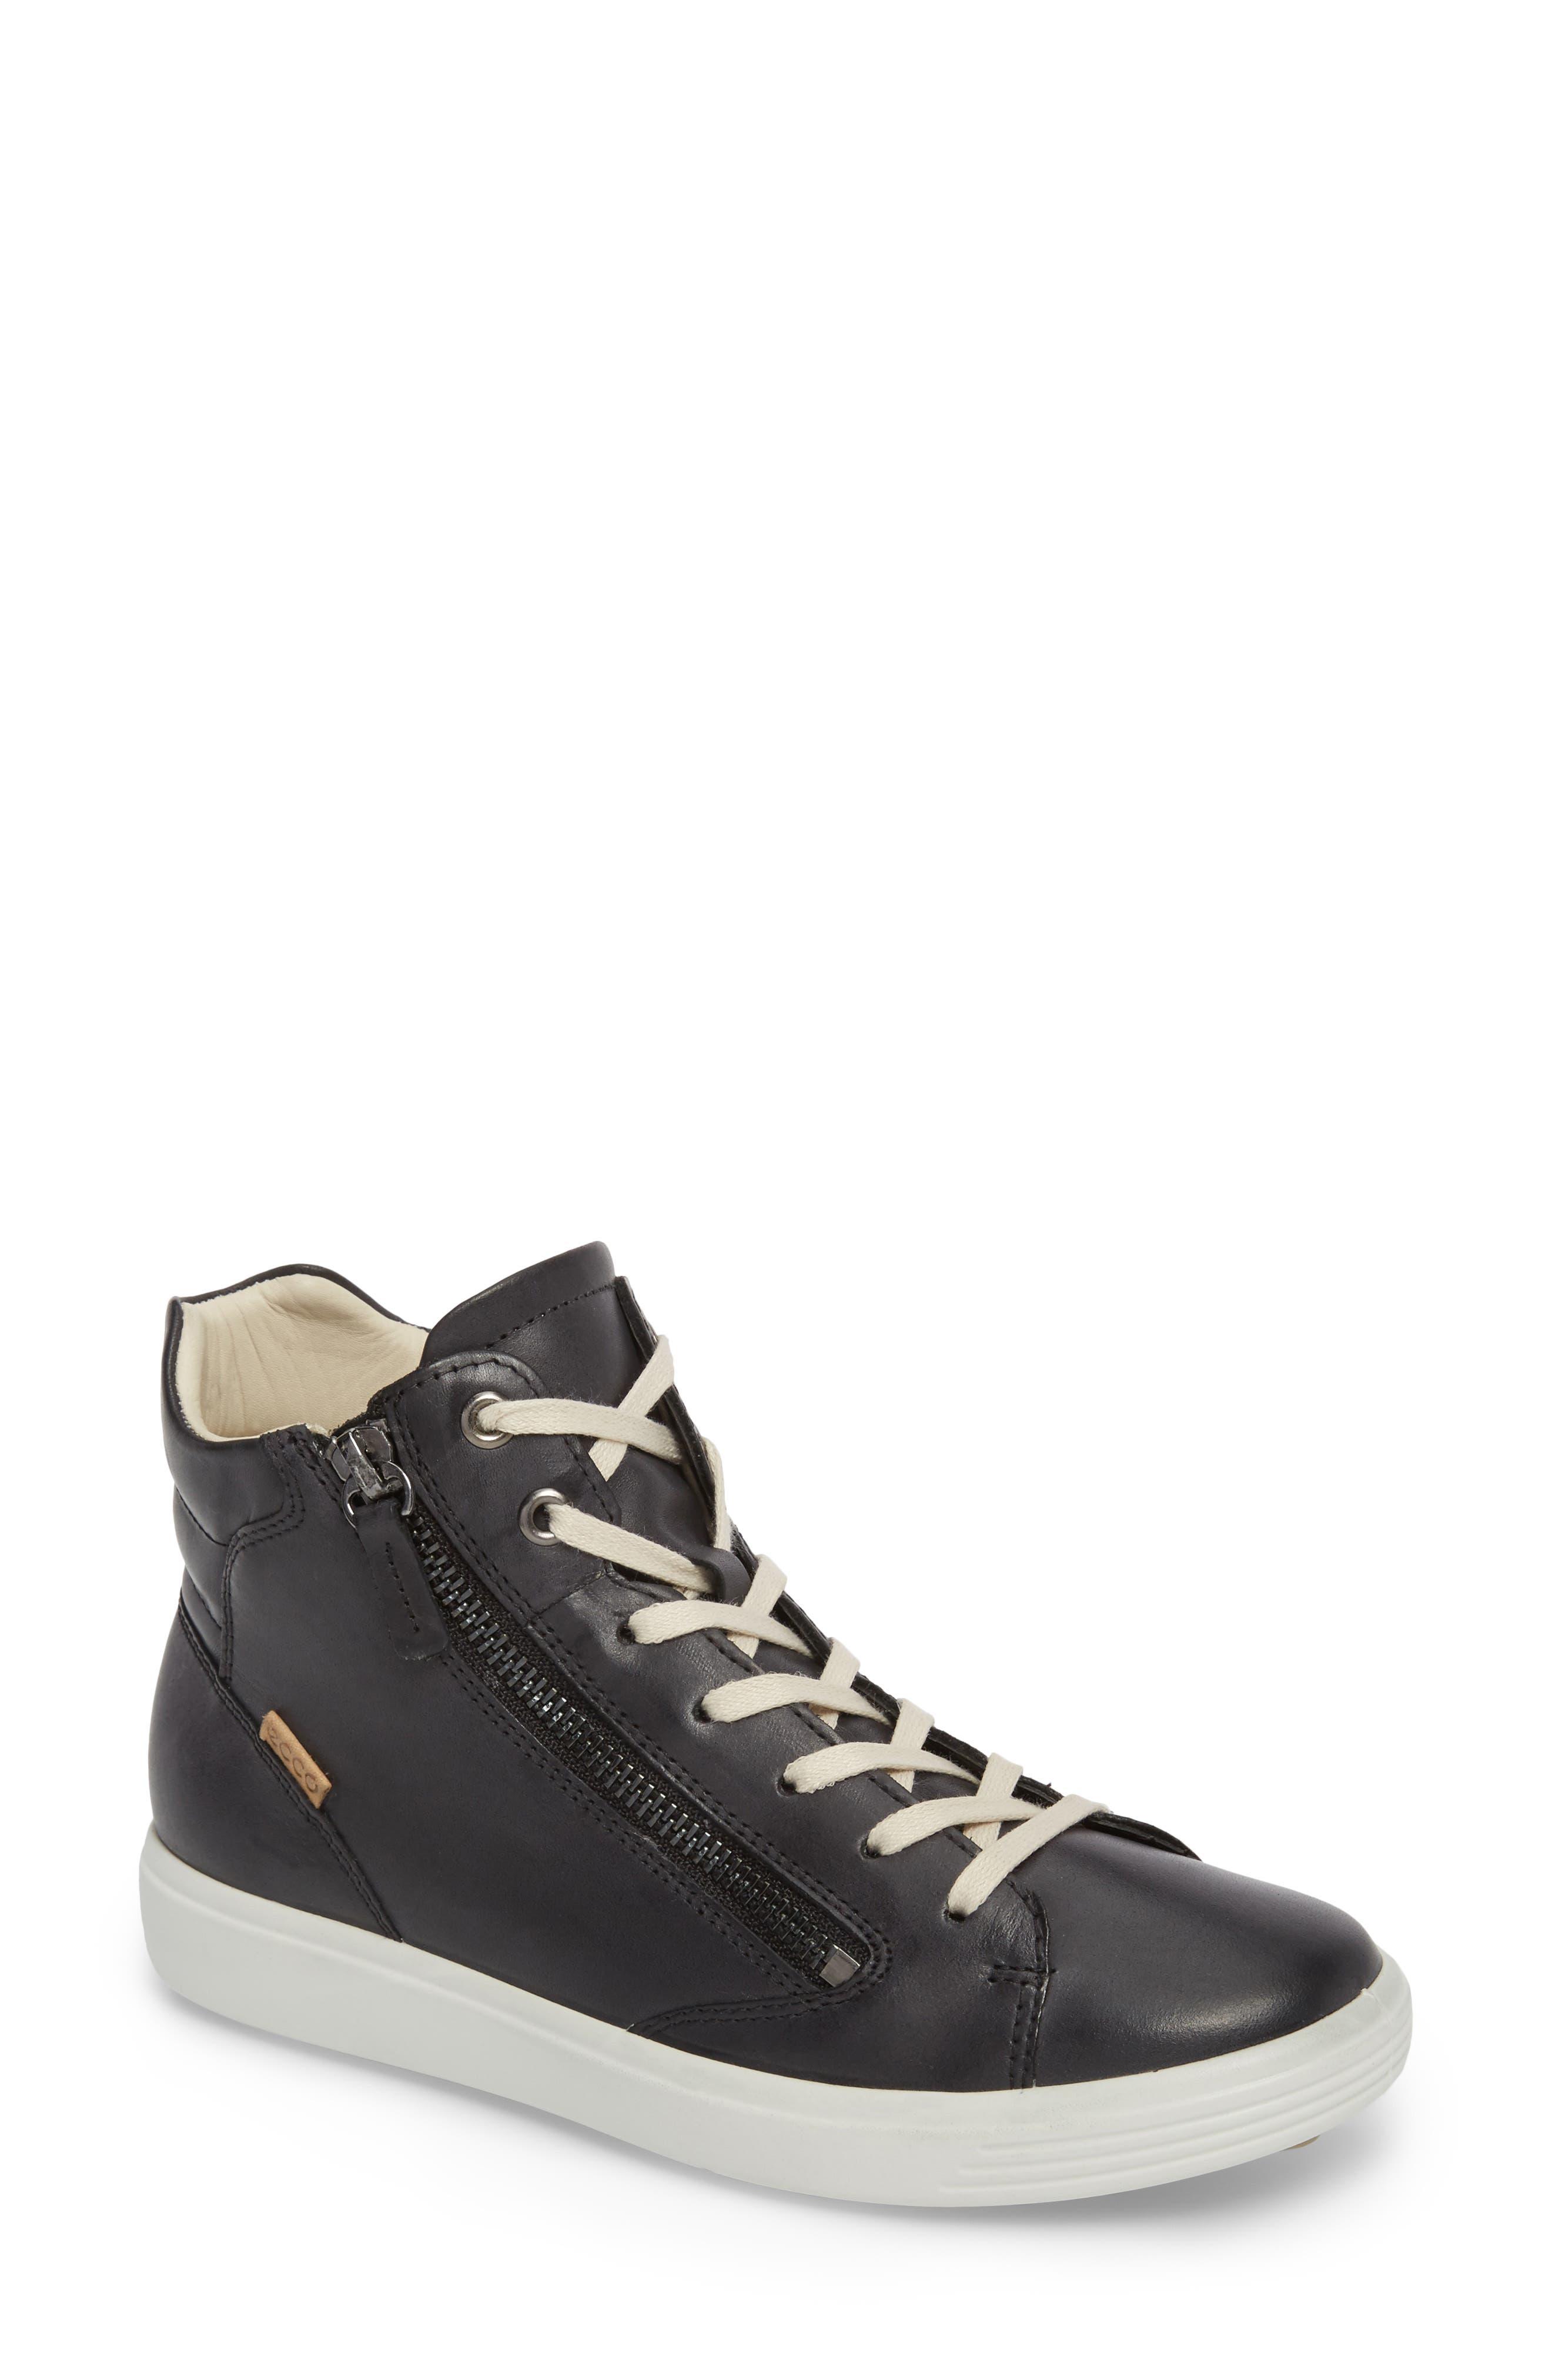 ECCO | Soft 7 High Top Sneaker